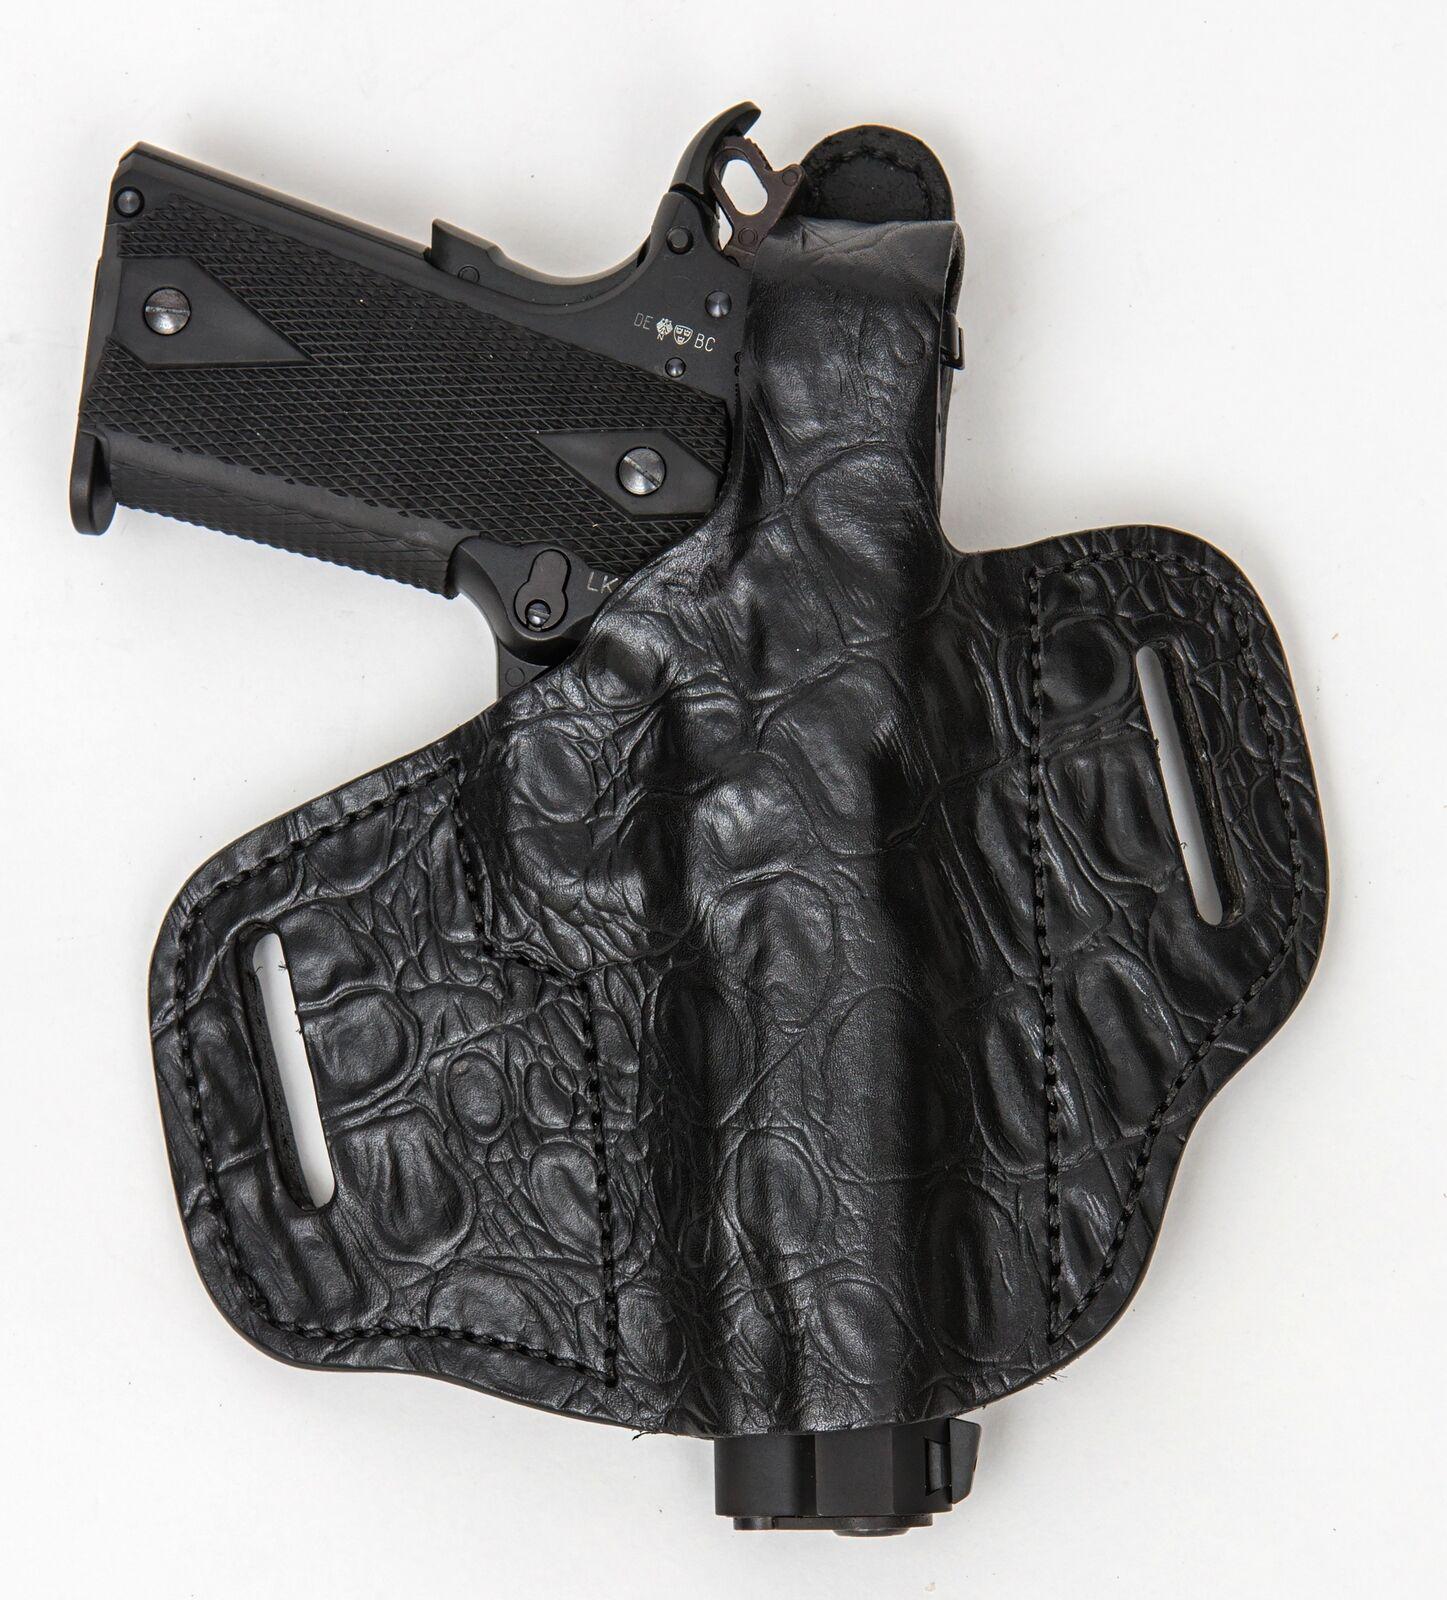 On Duty Conceal RH LH OWB Leder Gun Holster For Beretta Nano w/ CT Lasermax